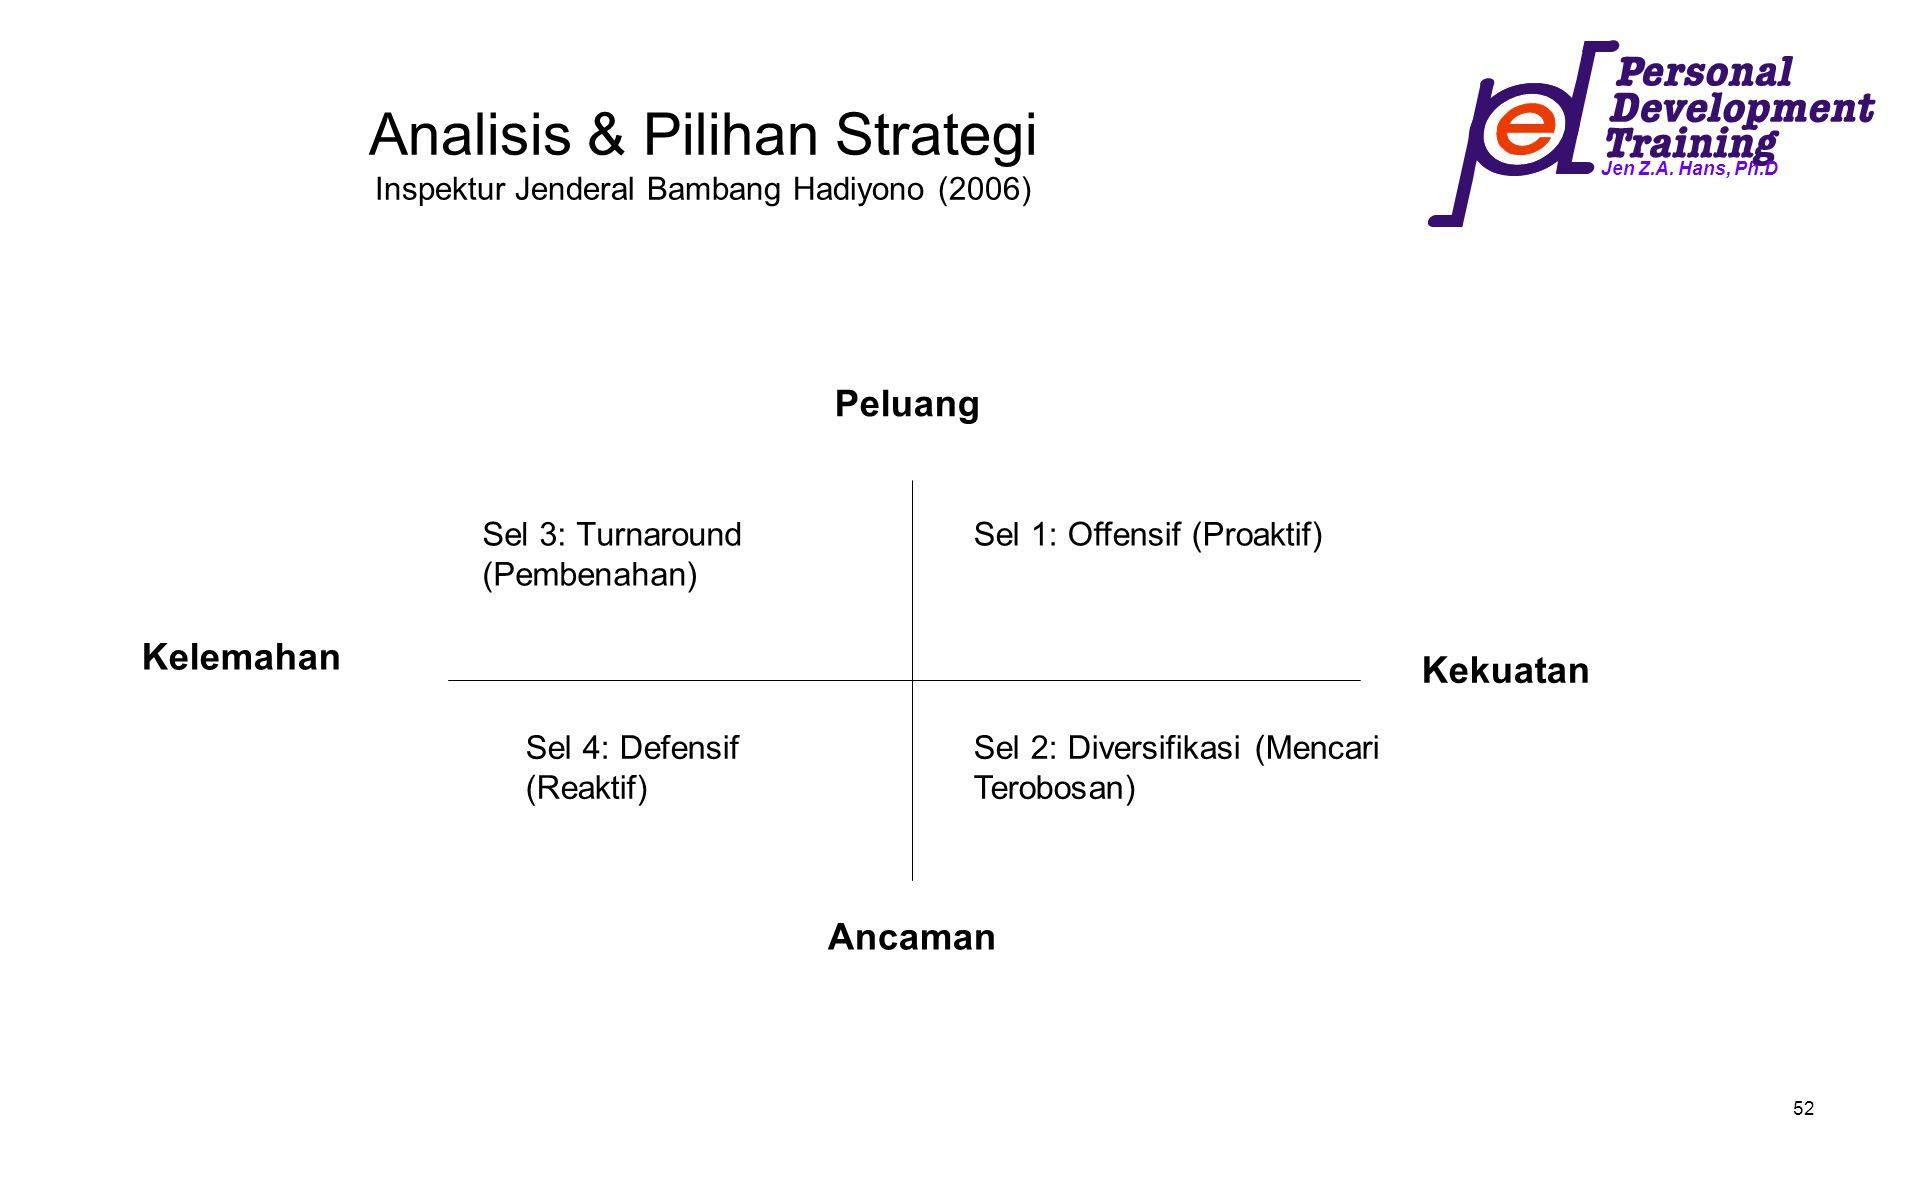 Jen Z.A. Hans, Ph.D 52 Analisis & Pilihan Strategi Inspektur Jenderal Bambang Hadiyono (2006) Sel 1: Offensif (Proaktif)Sel 3: Turnaround (Pembenahan)